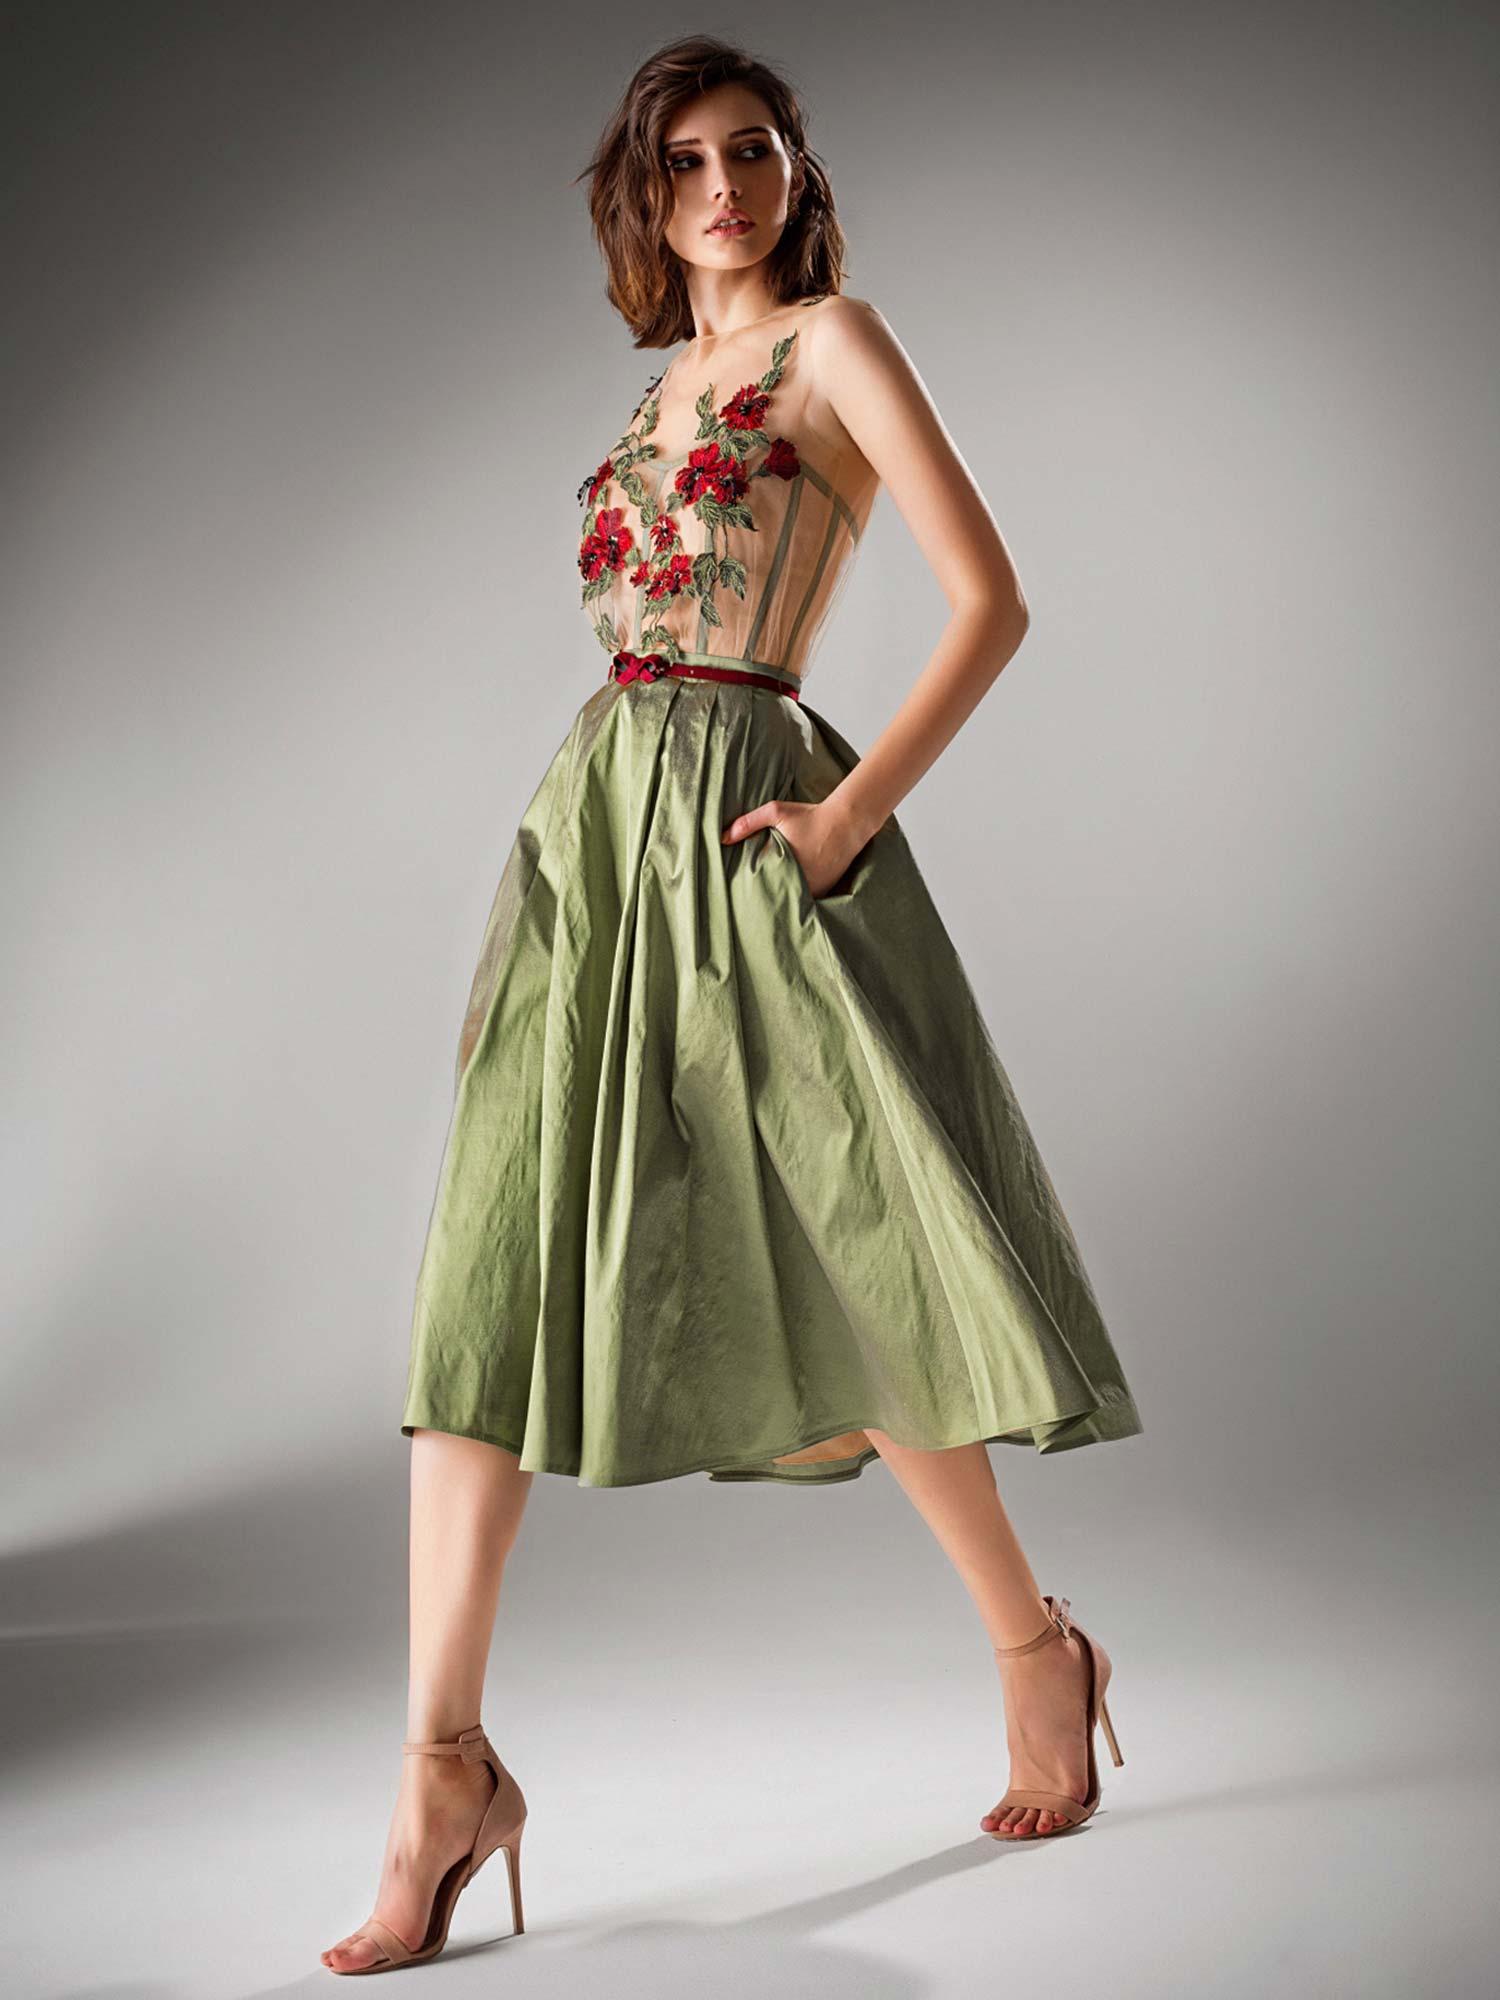 Style #423